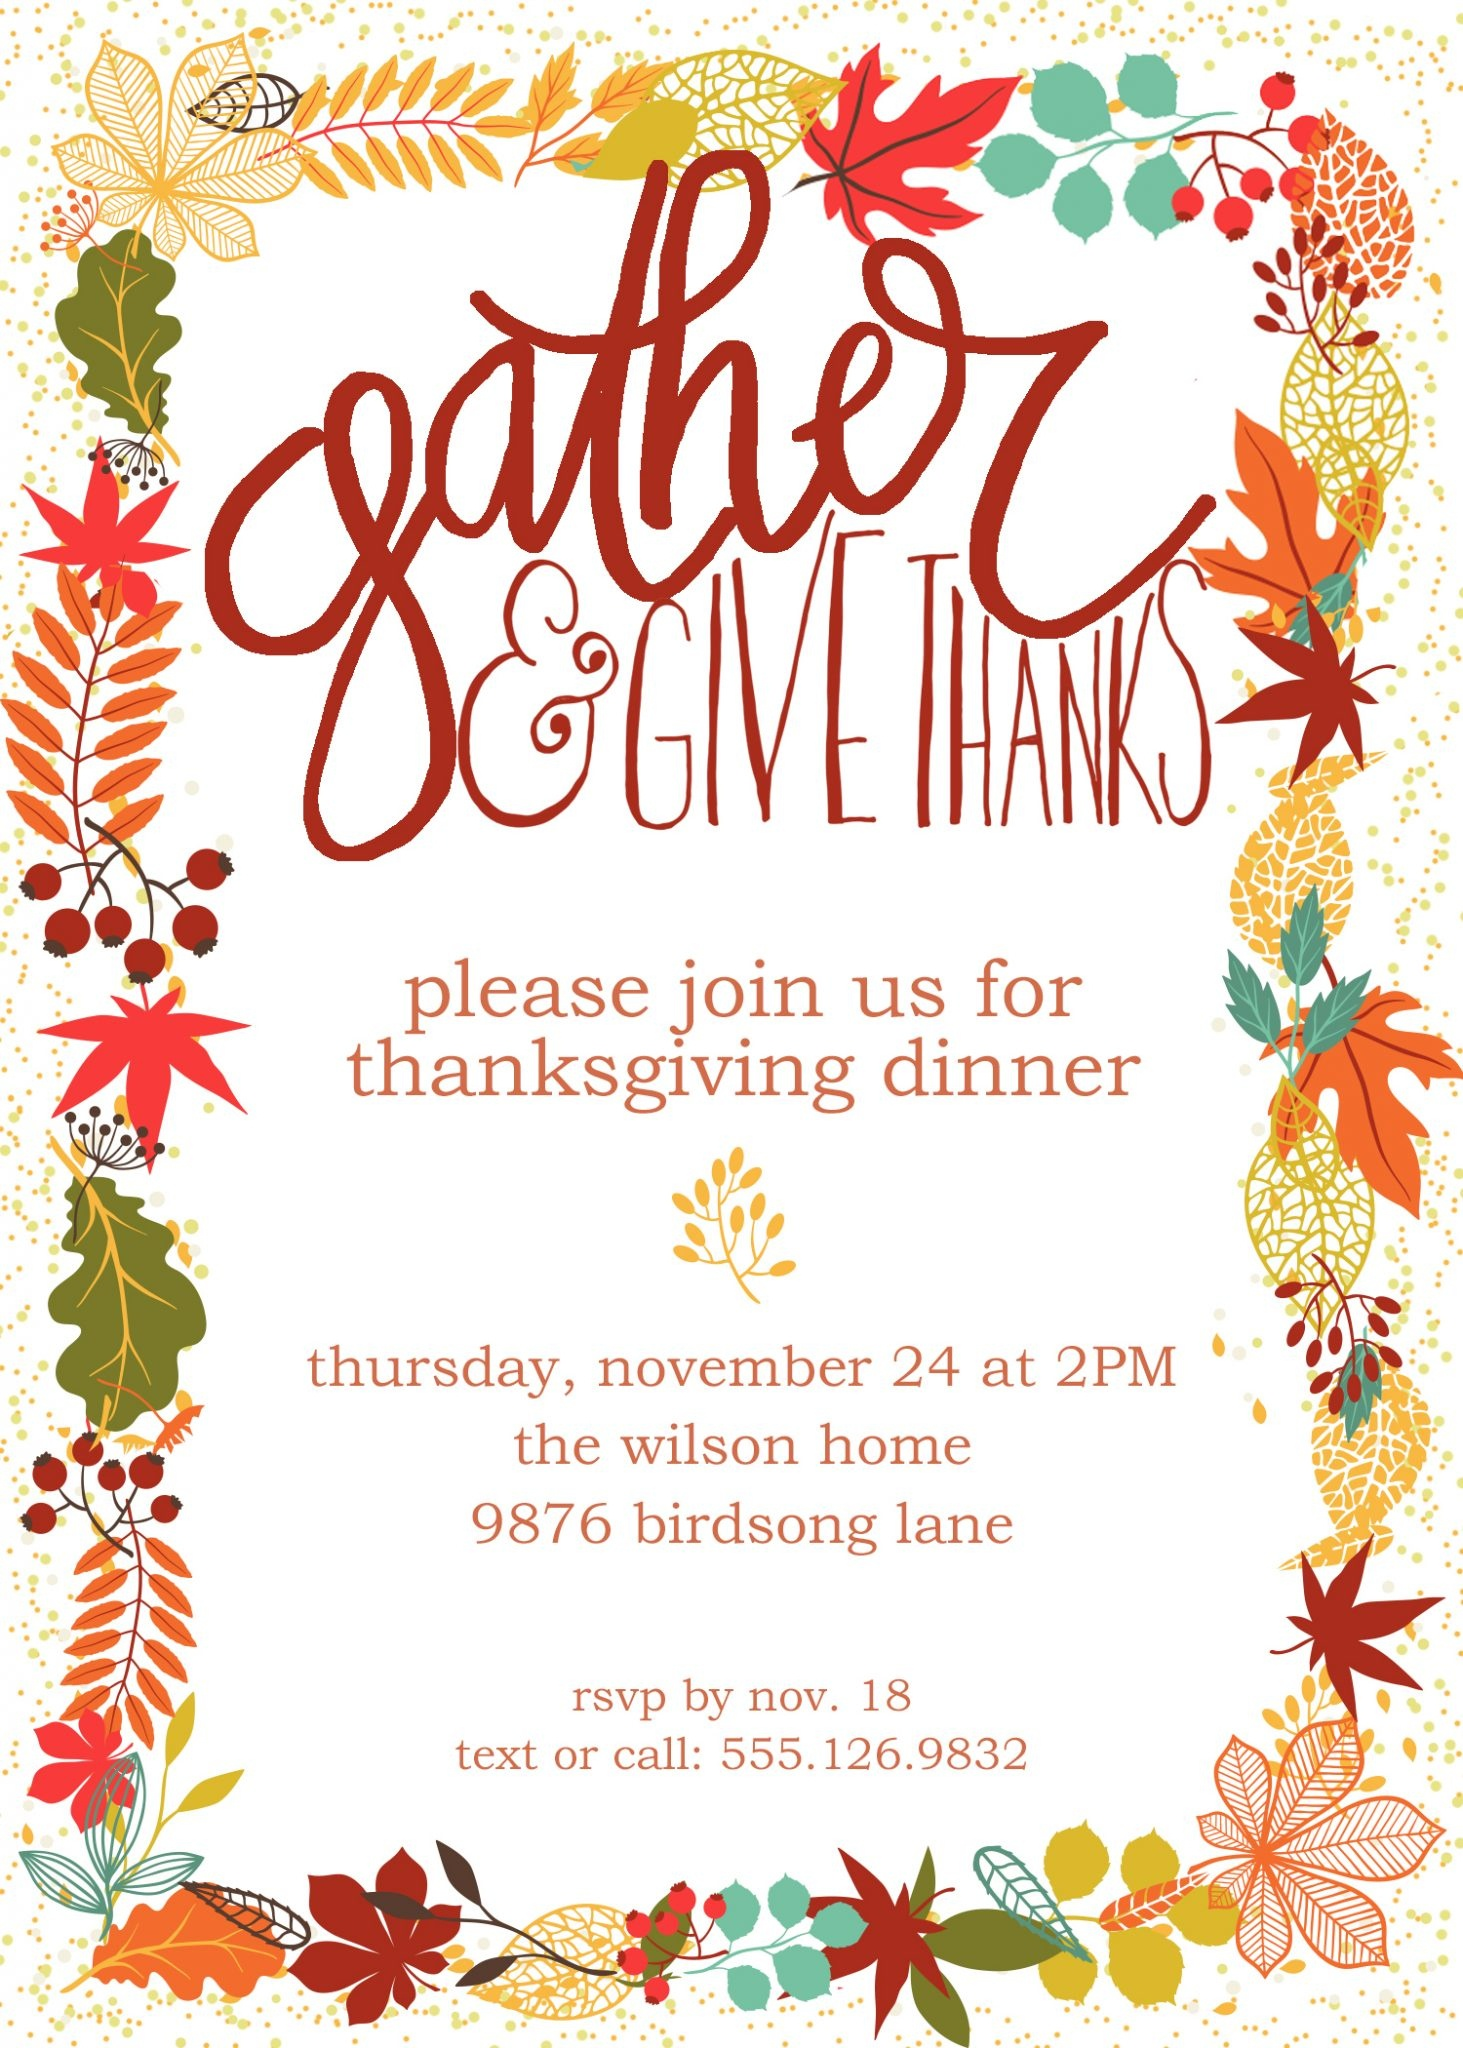 Customizable Thanksgiving Invitation | Free Printable - Free Printable Invitations